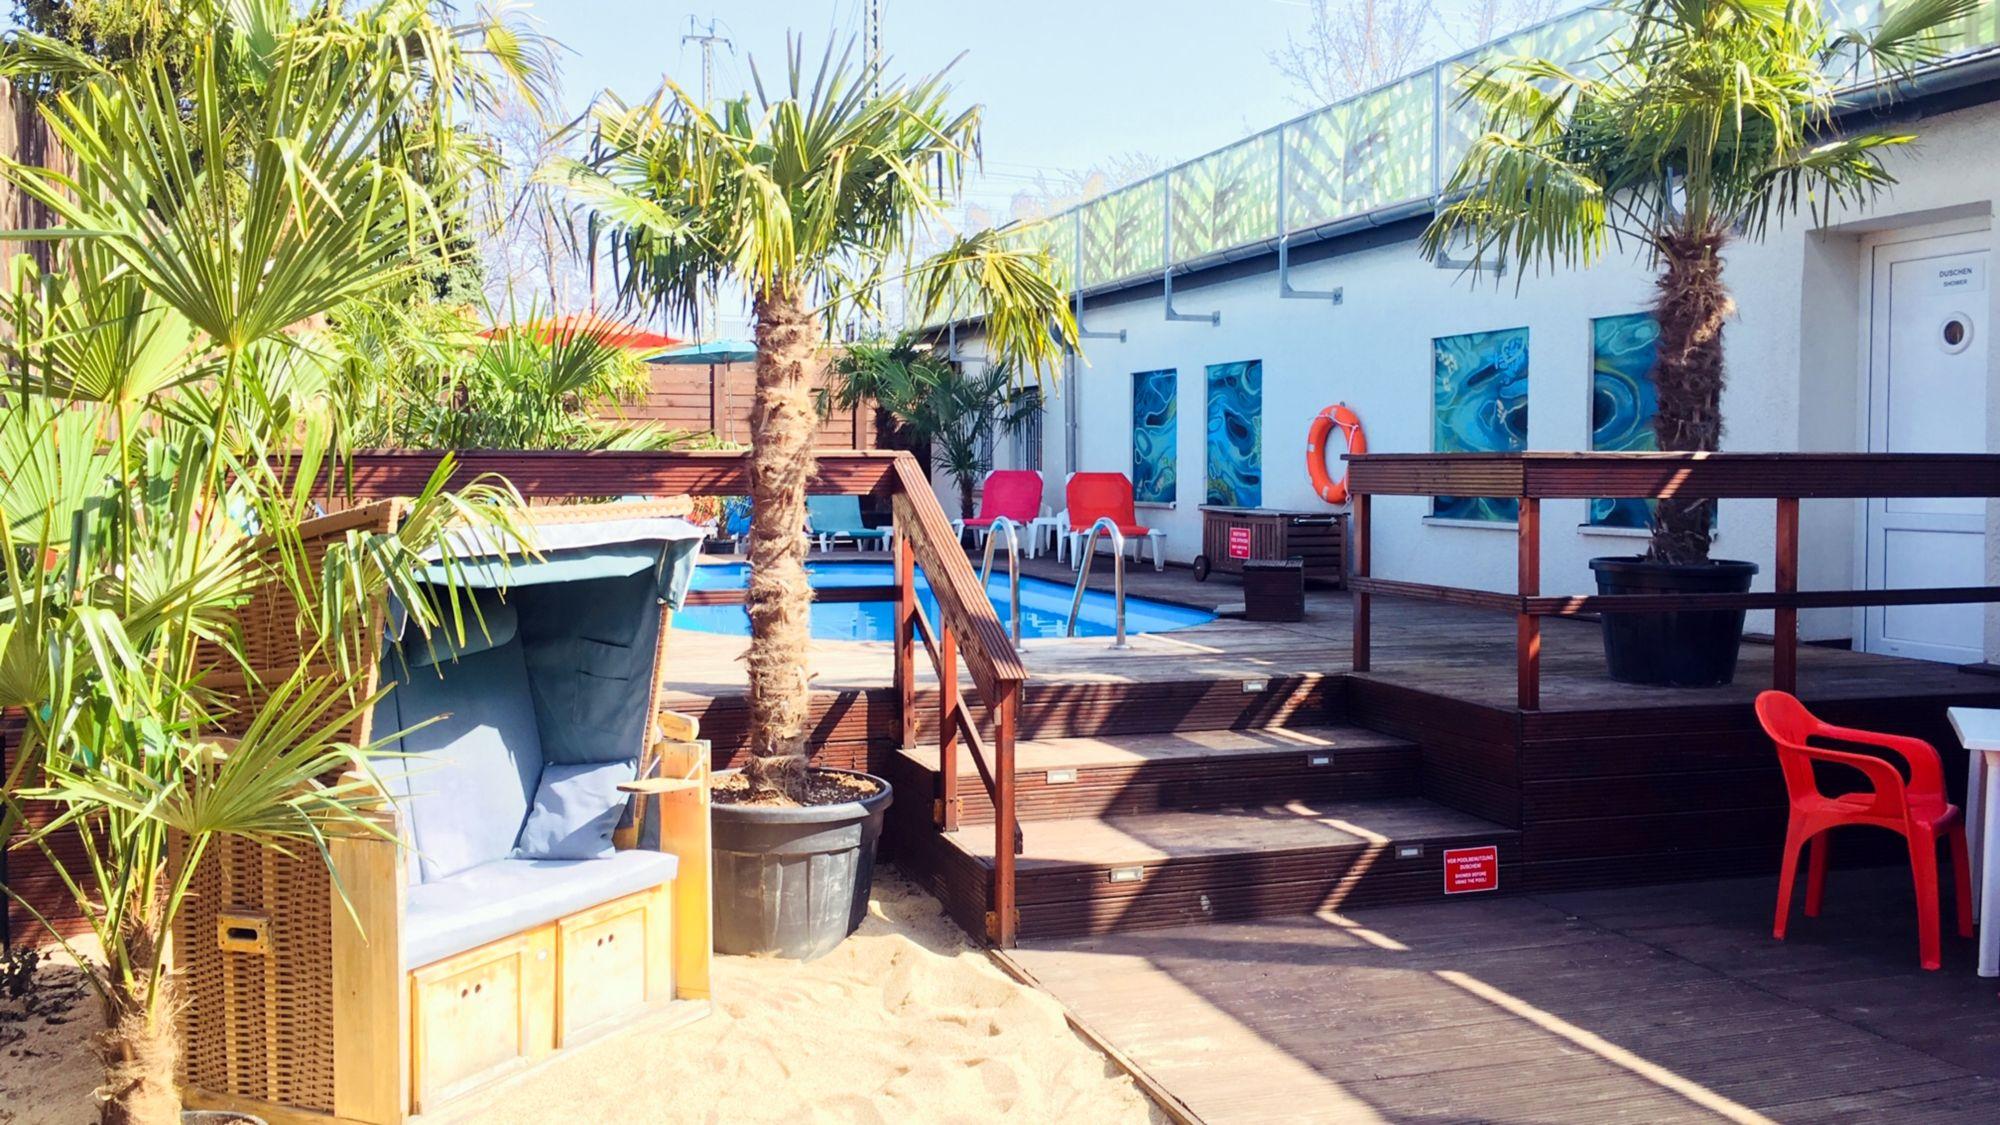 Home of Homolulu - Pool im Hof des paradisischen Clubs.